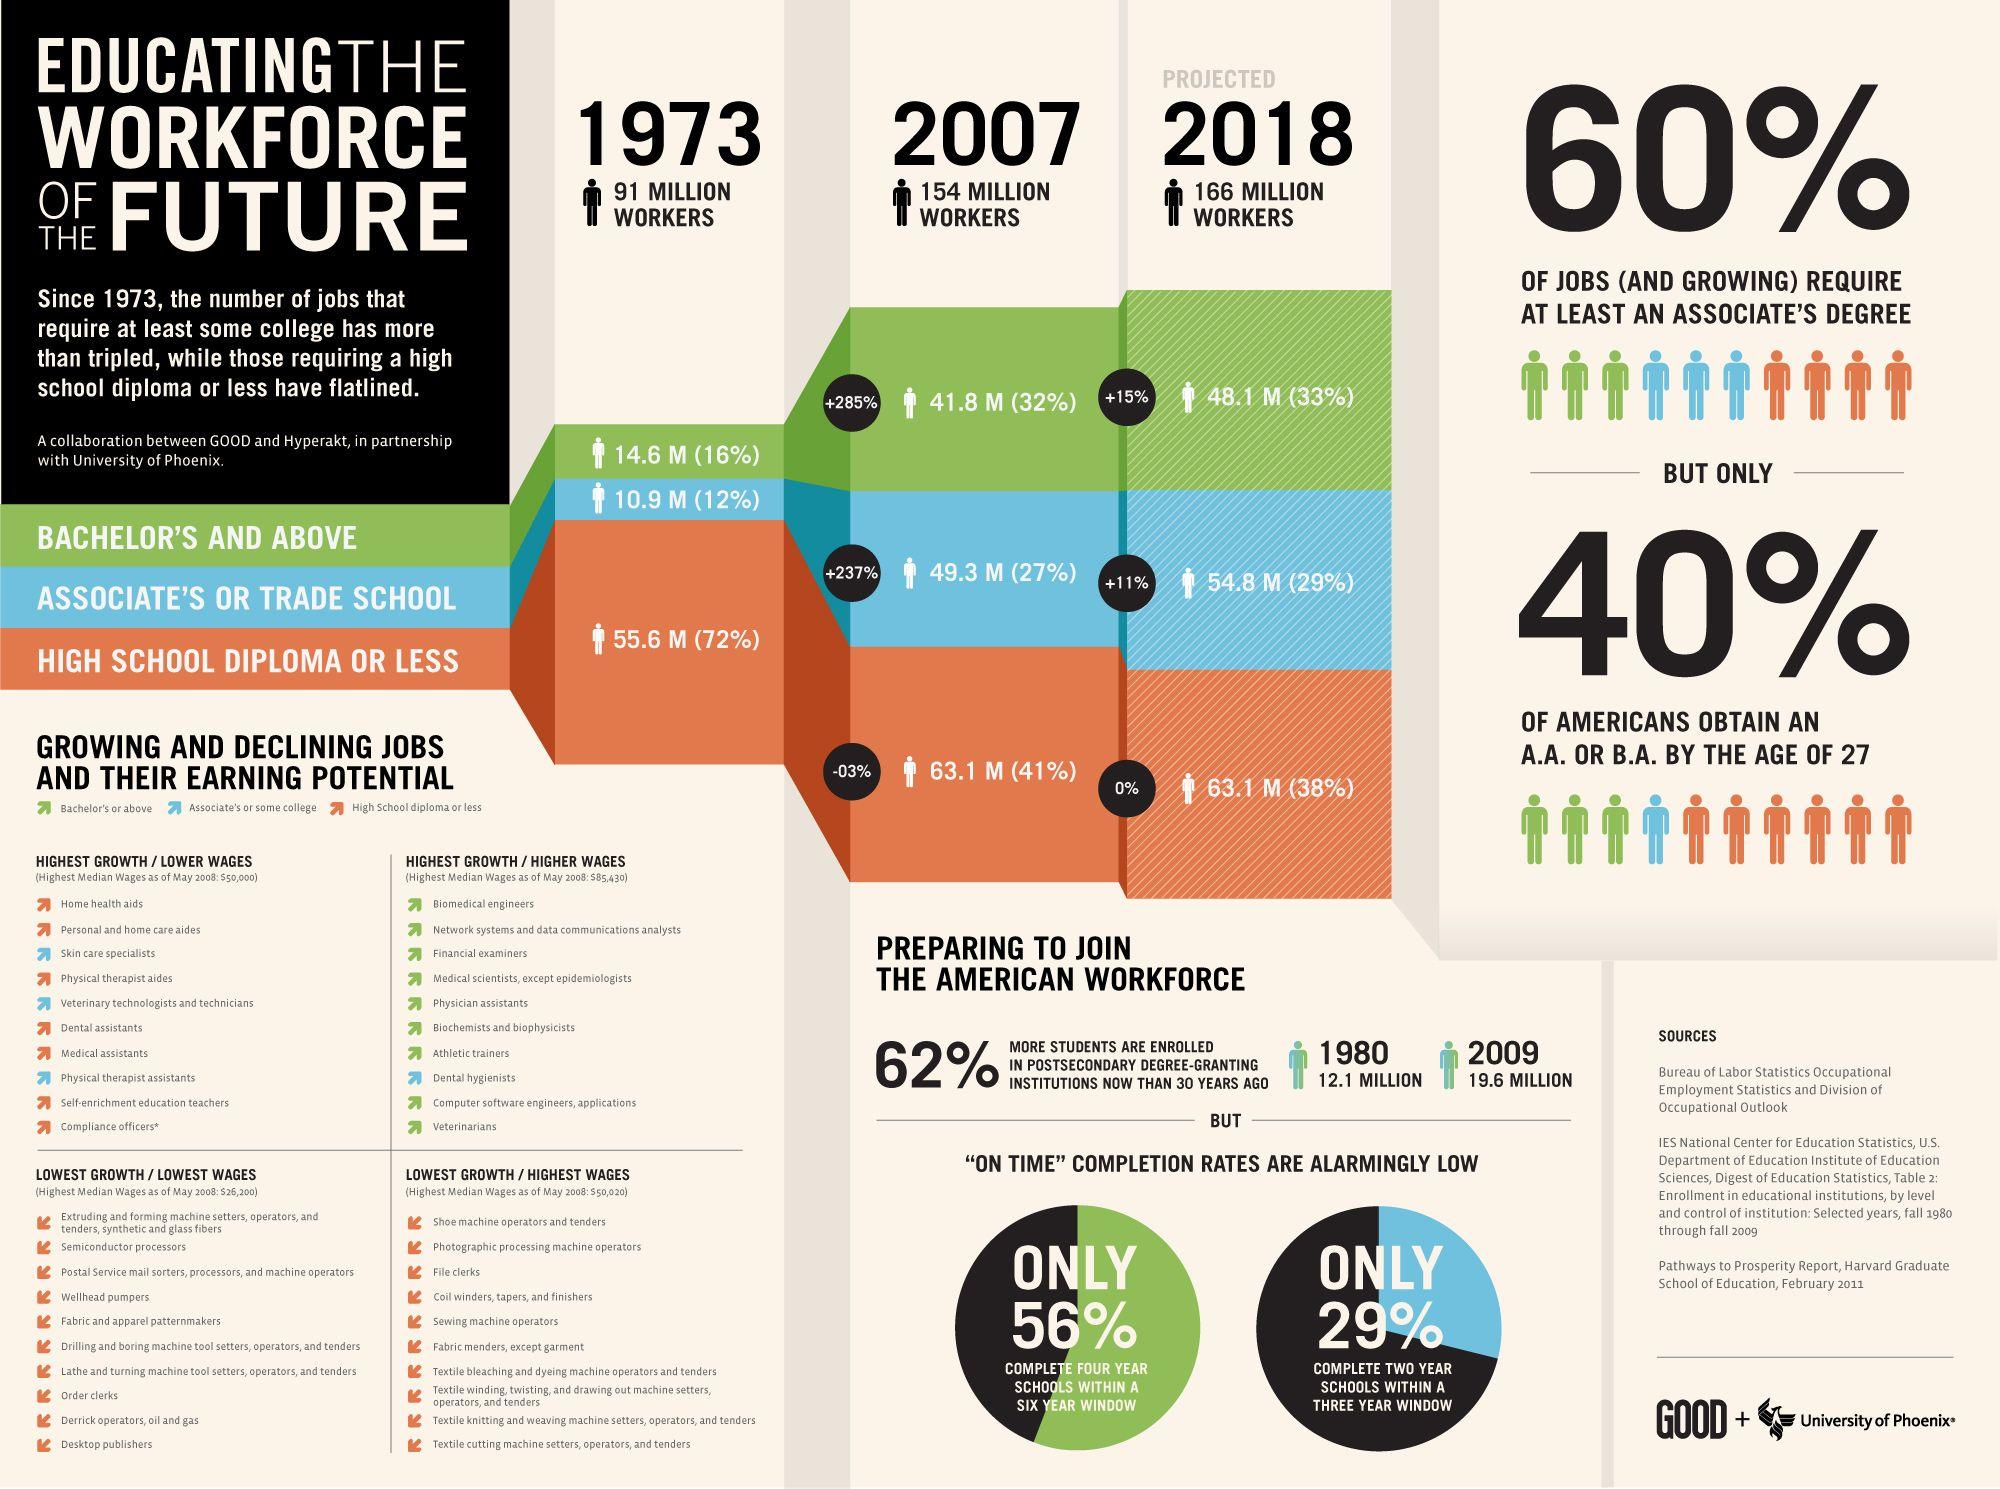 Workforce of the future ....Is it true ?